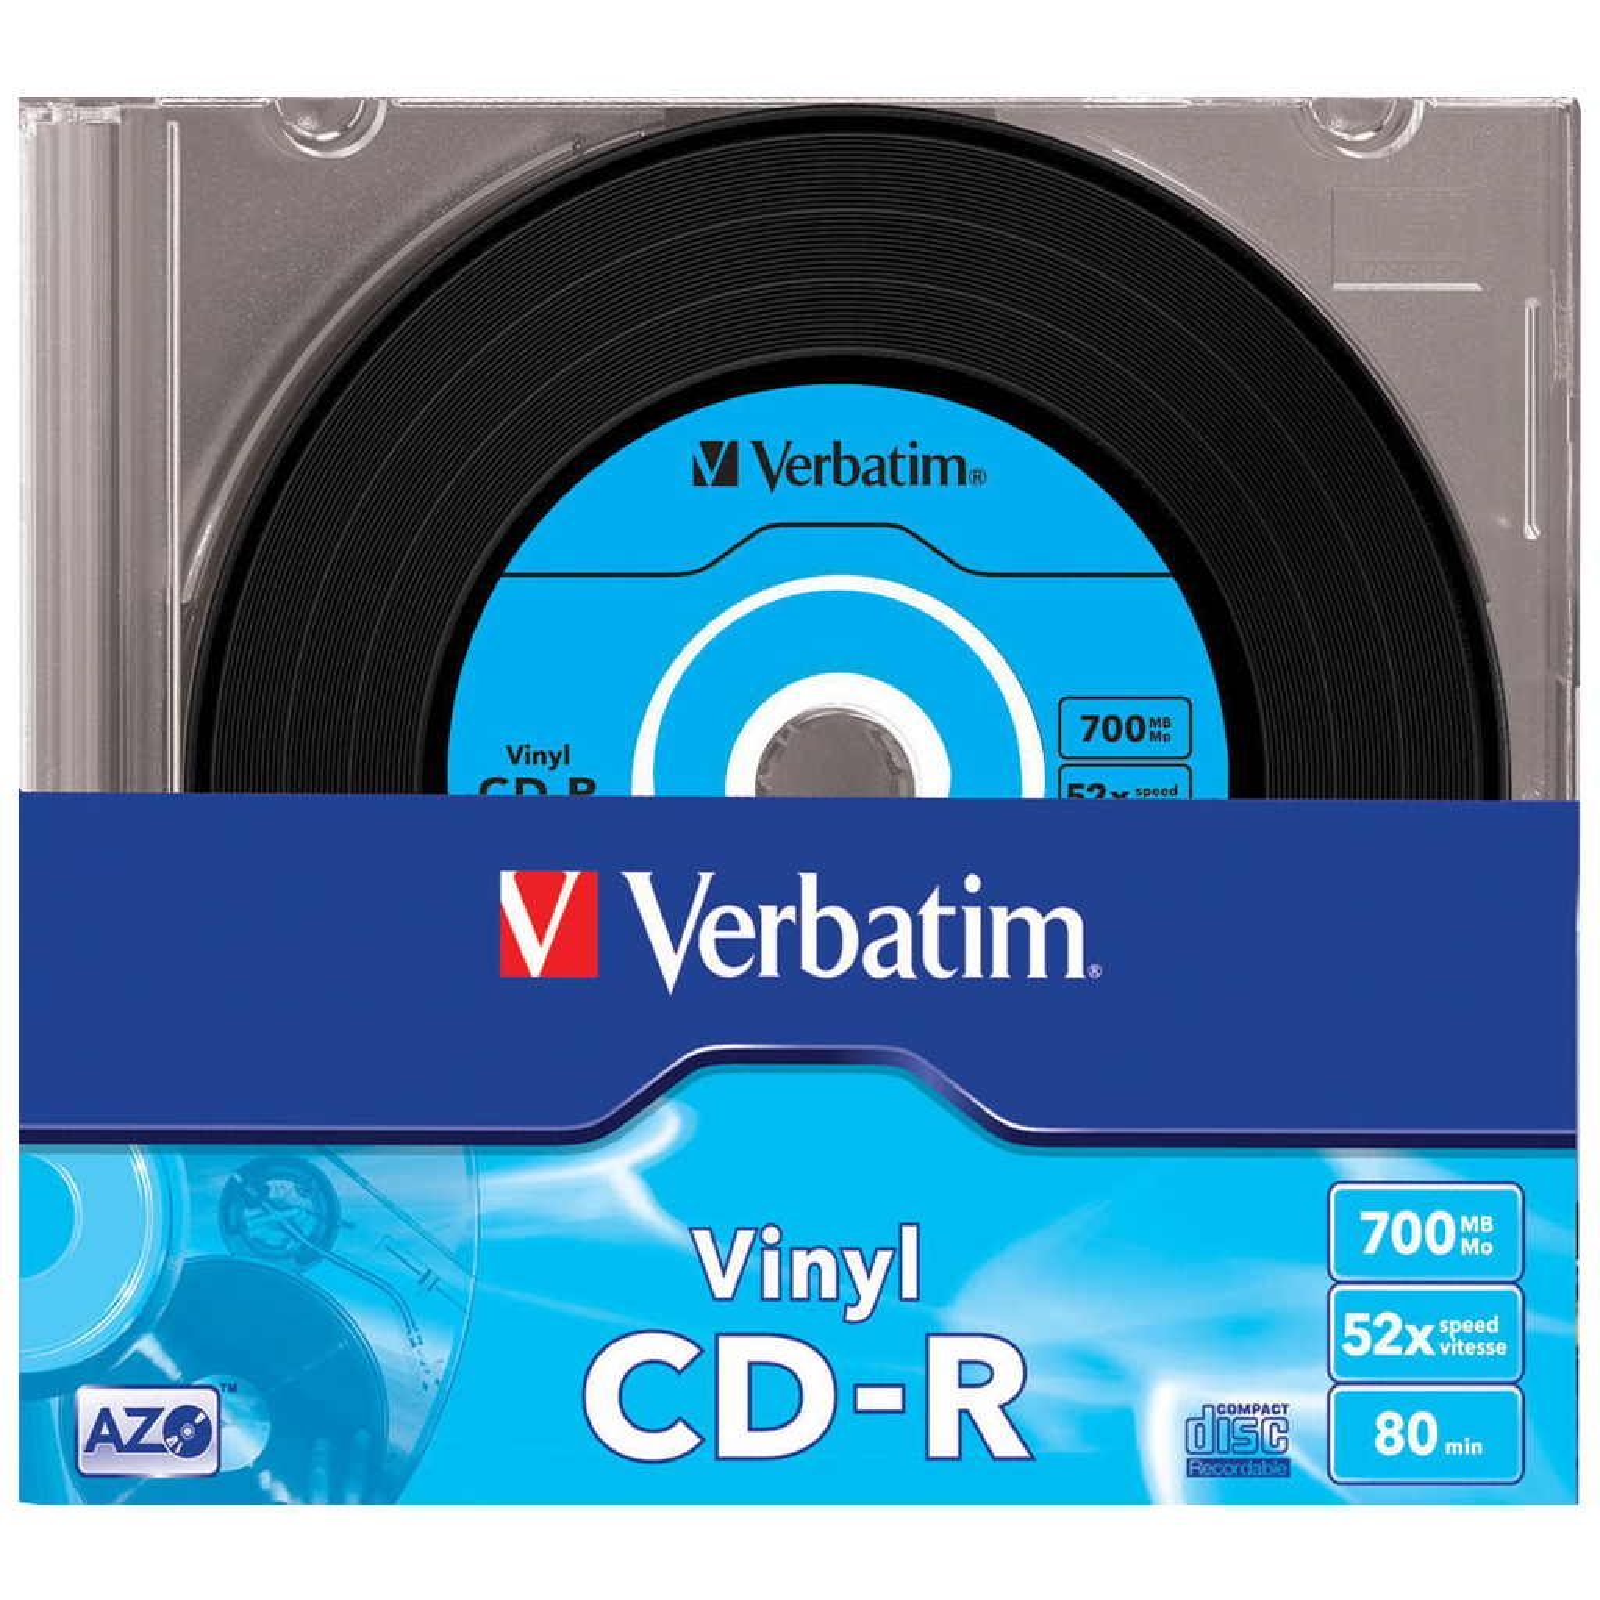 Диск CD Verbatim 700Mb 52x Slim case Vinyl AZO (43426) изображение 2